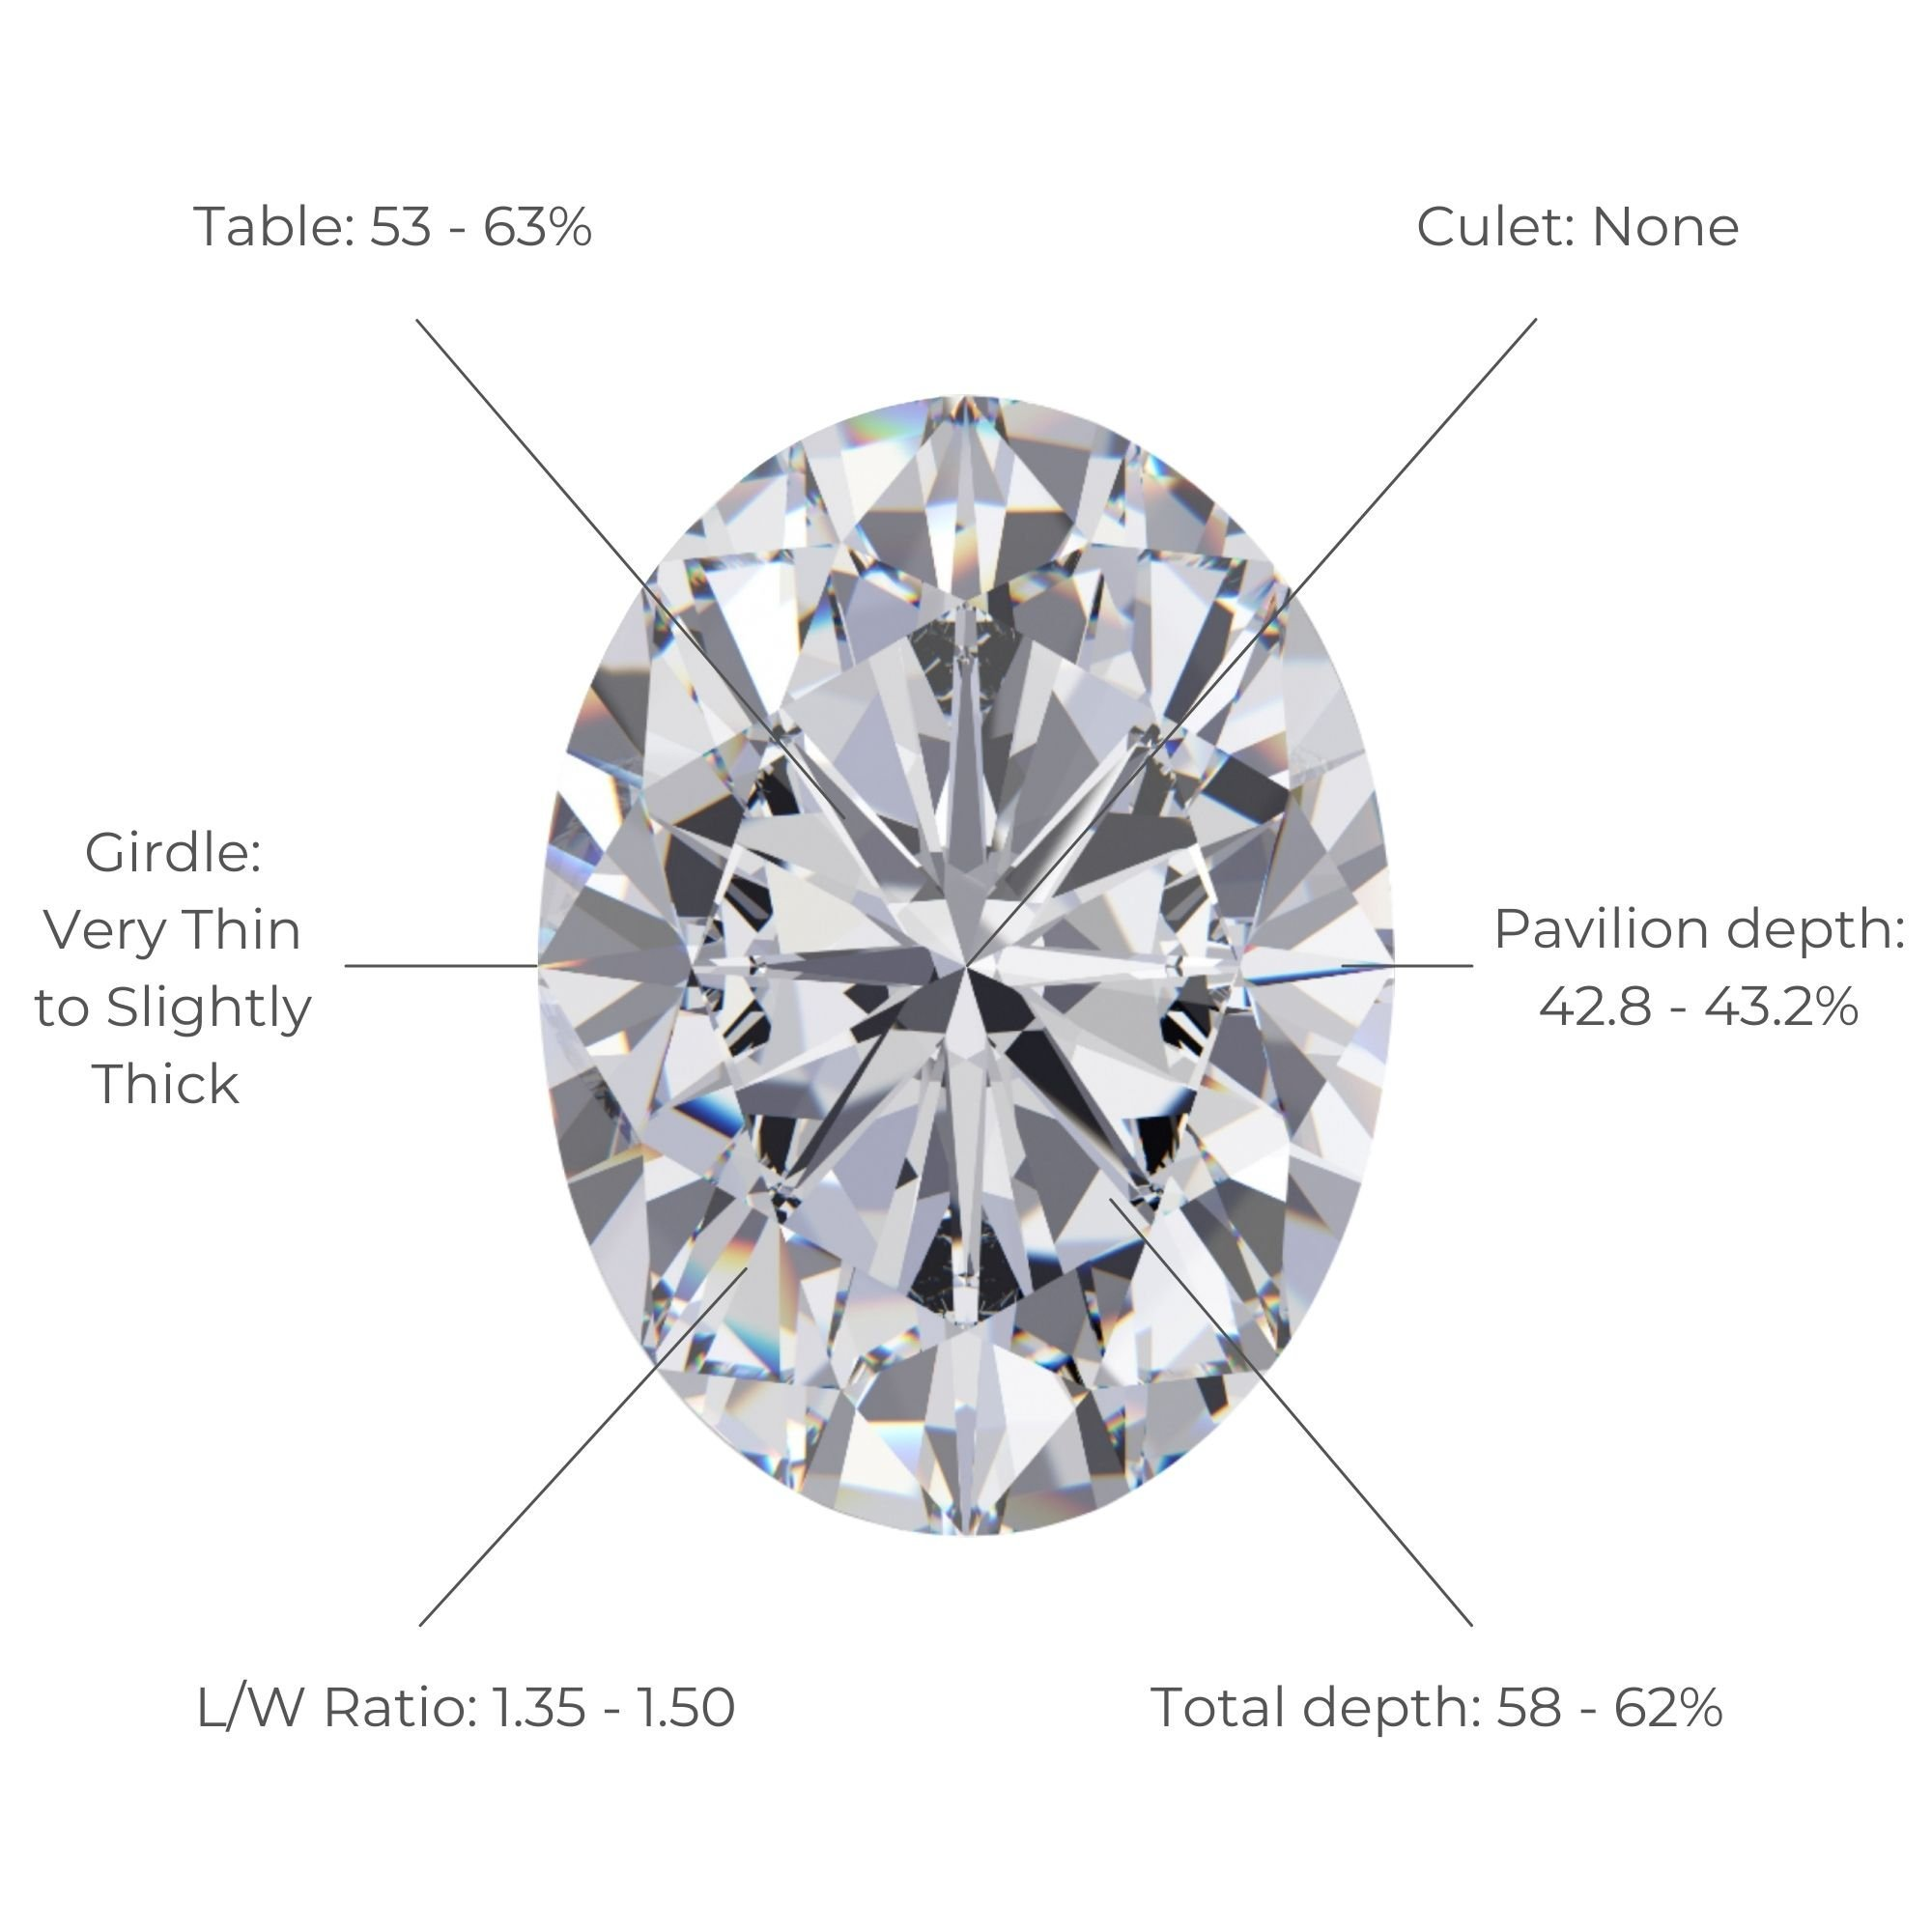 Ideal Oval Cut Diamond Proportions   Diamond Buzz